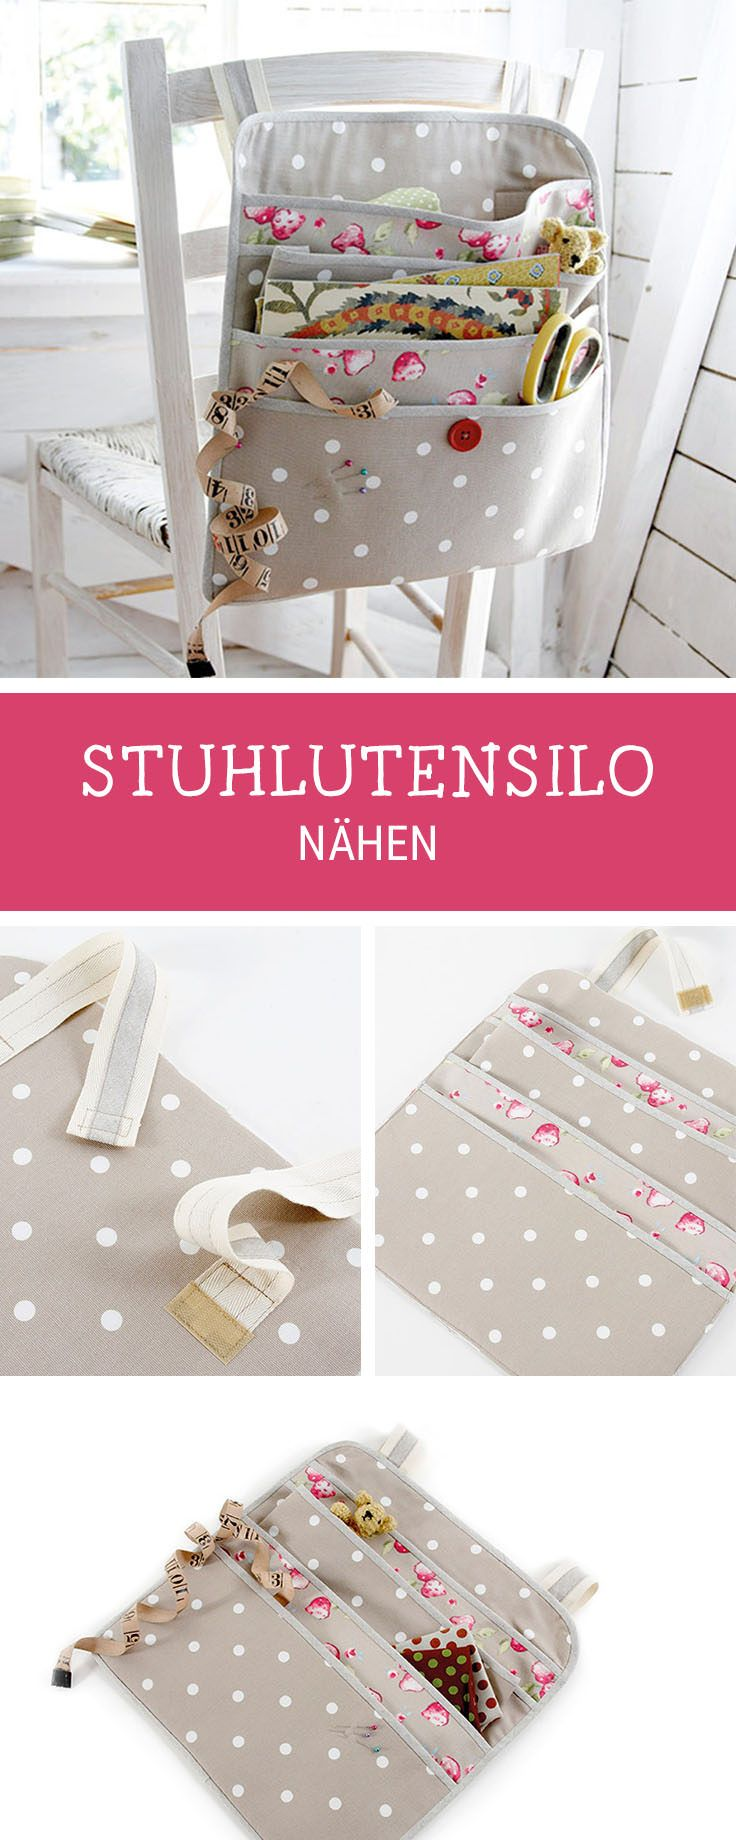 Photo of Ideen für mehr Ordnung: Utensilo nähen, dass man an den Stuhl hängen kann, St…